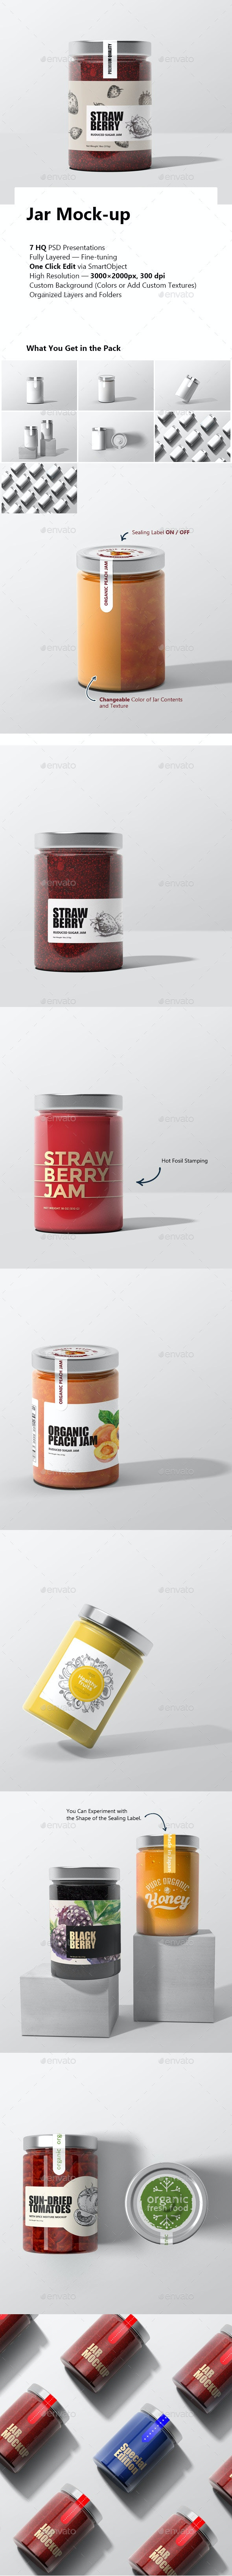 Jar Mock-up - Food and Drink Packaging